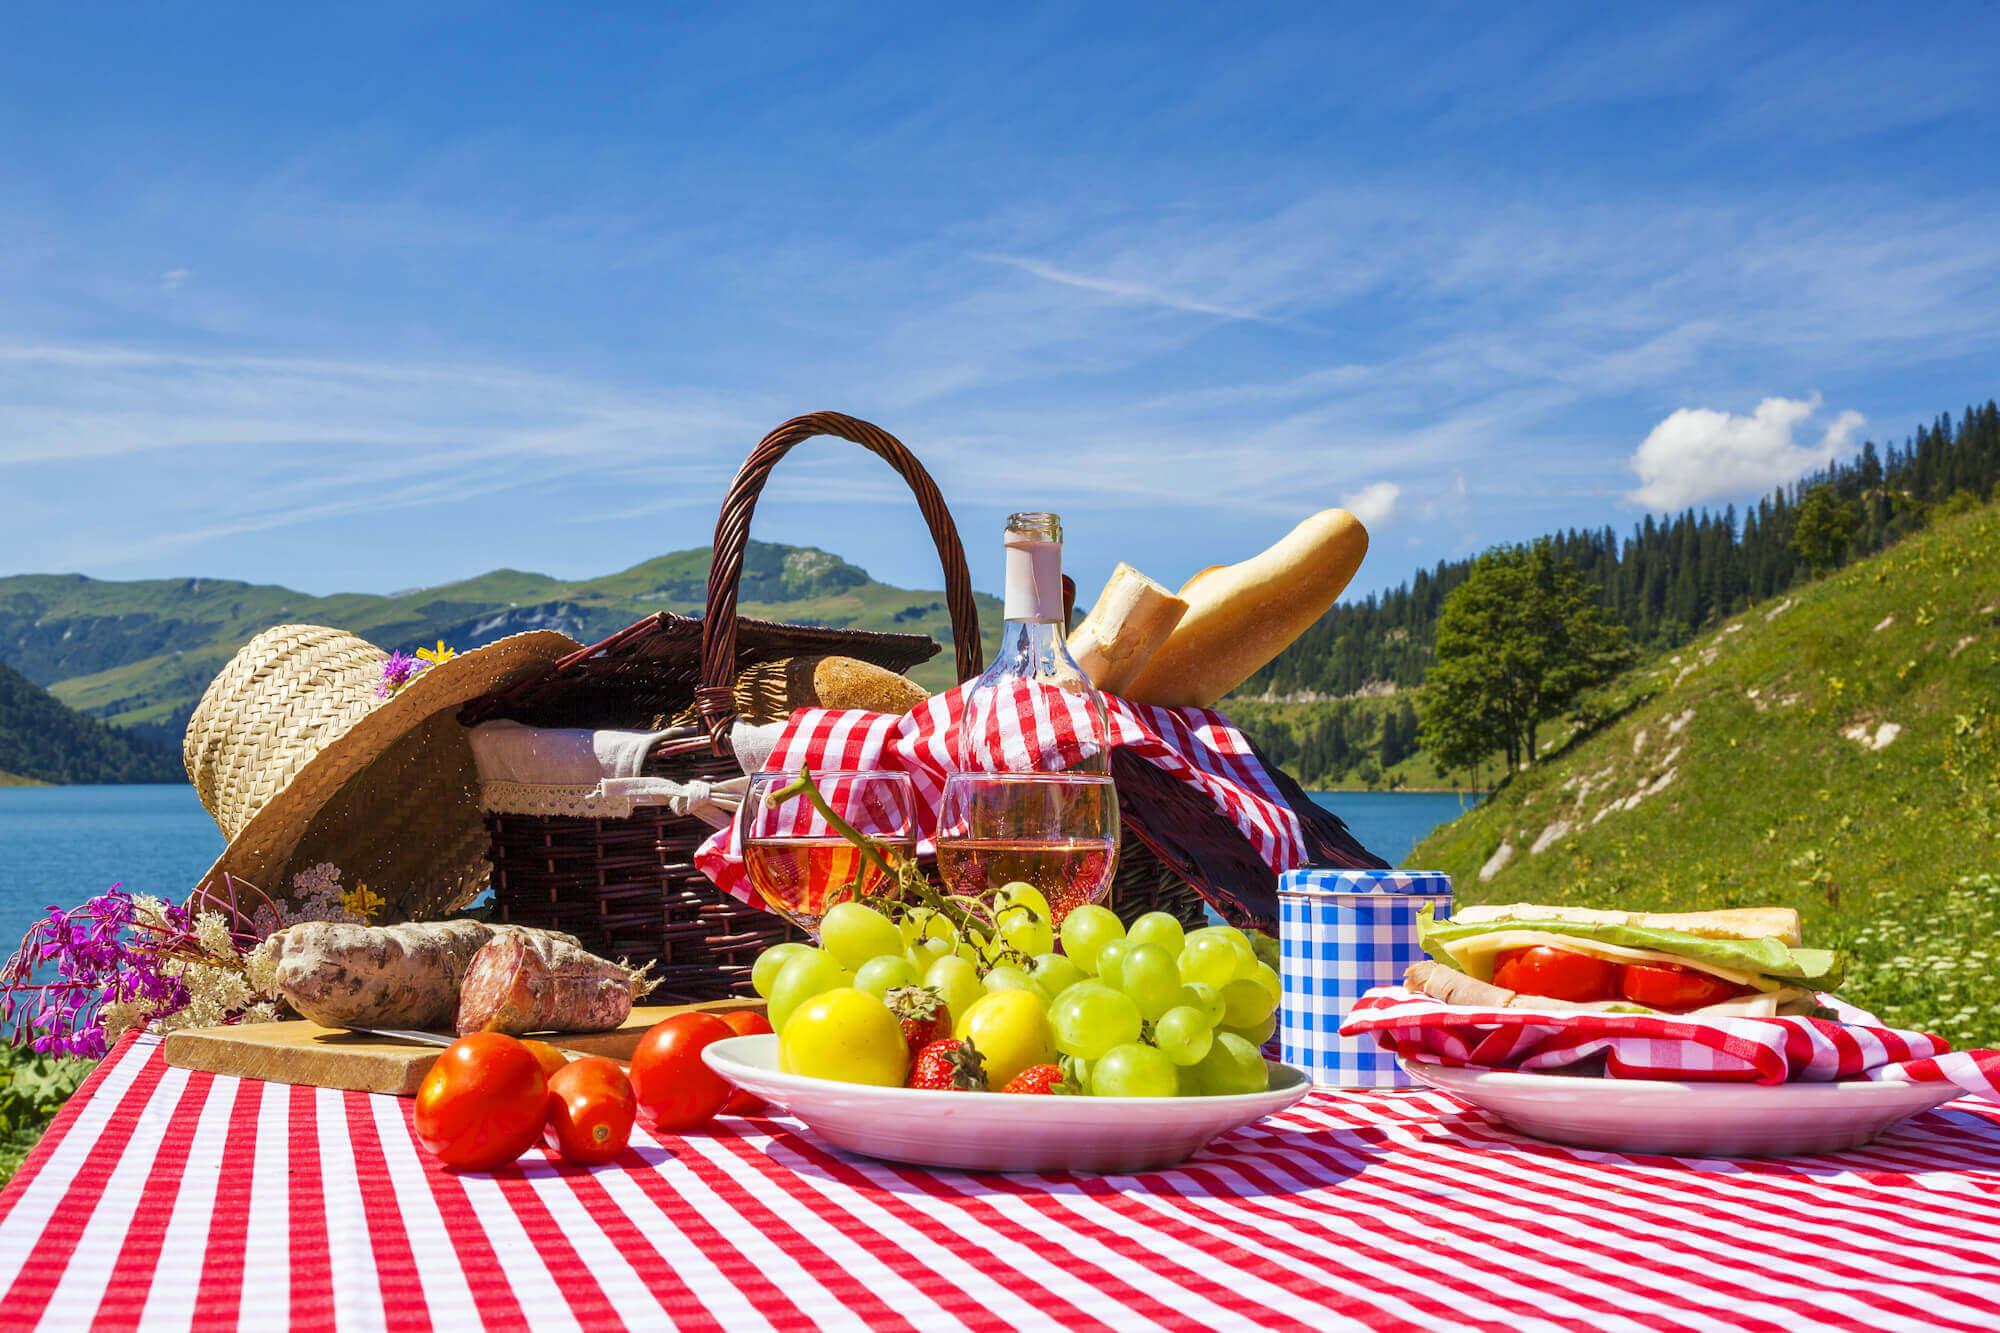 aspen-picnic-lunches